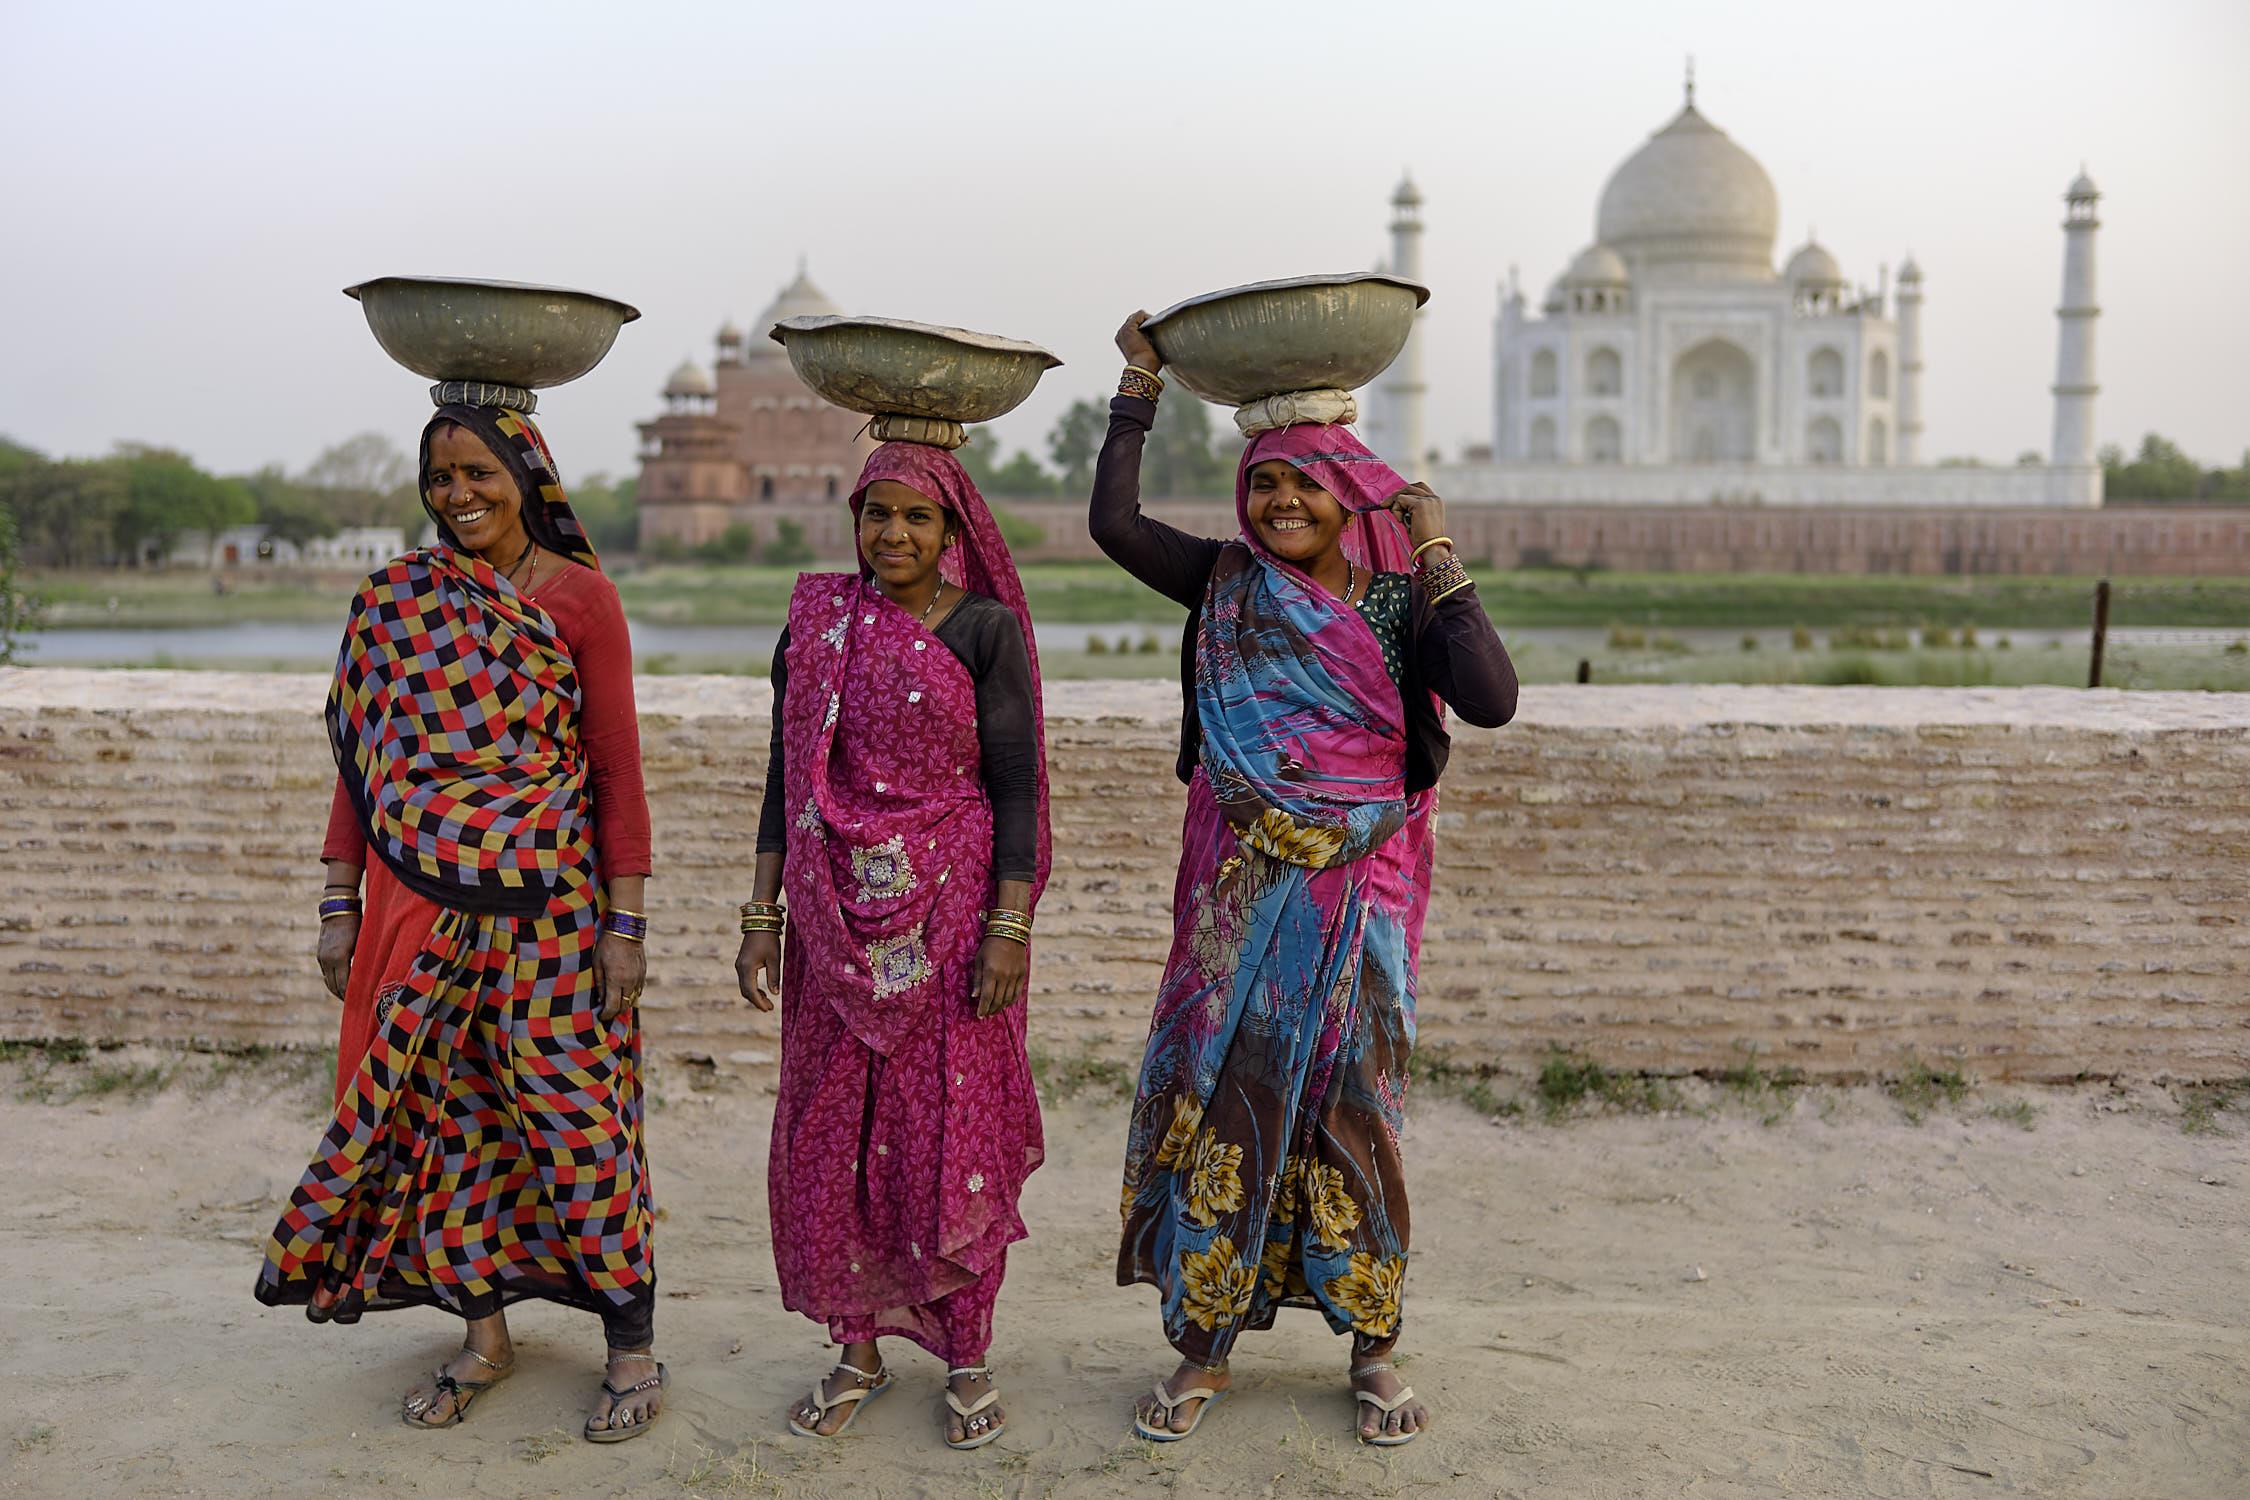 Three posers at Taj Mahal, India